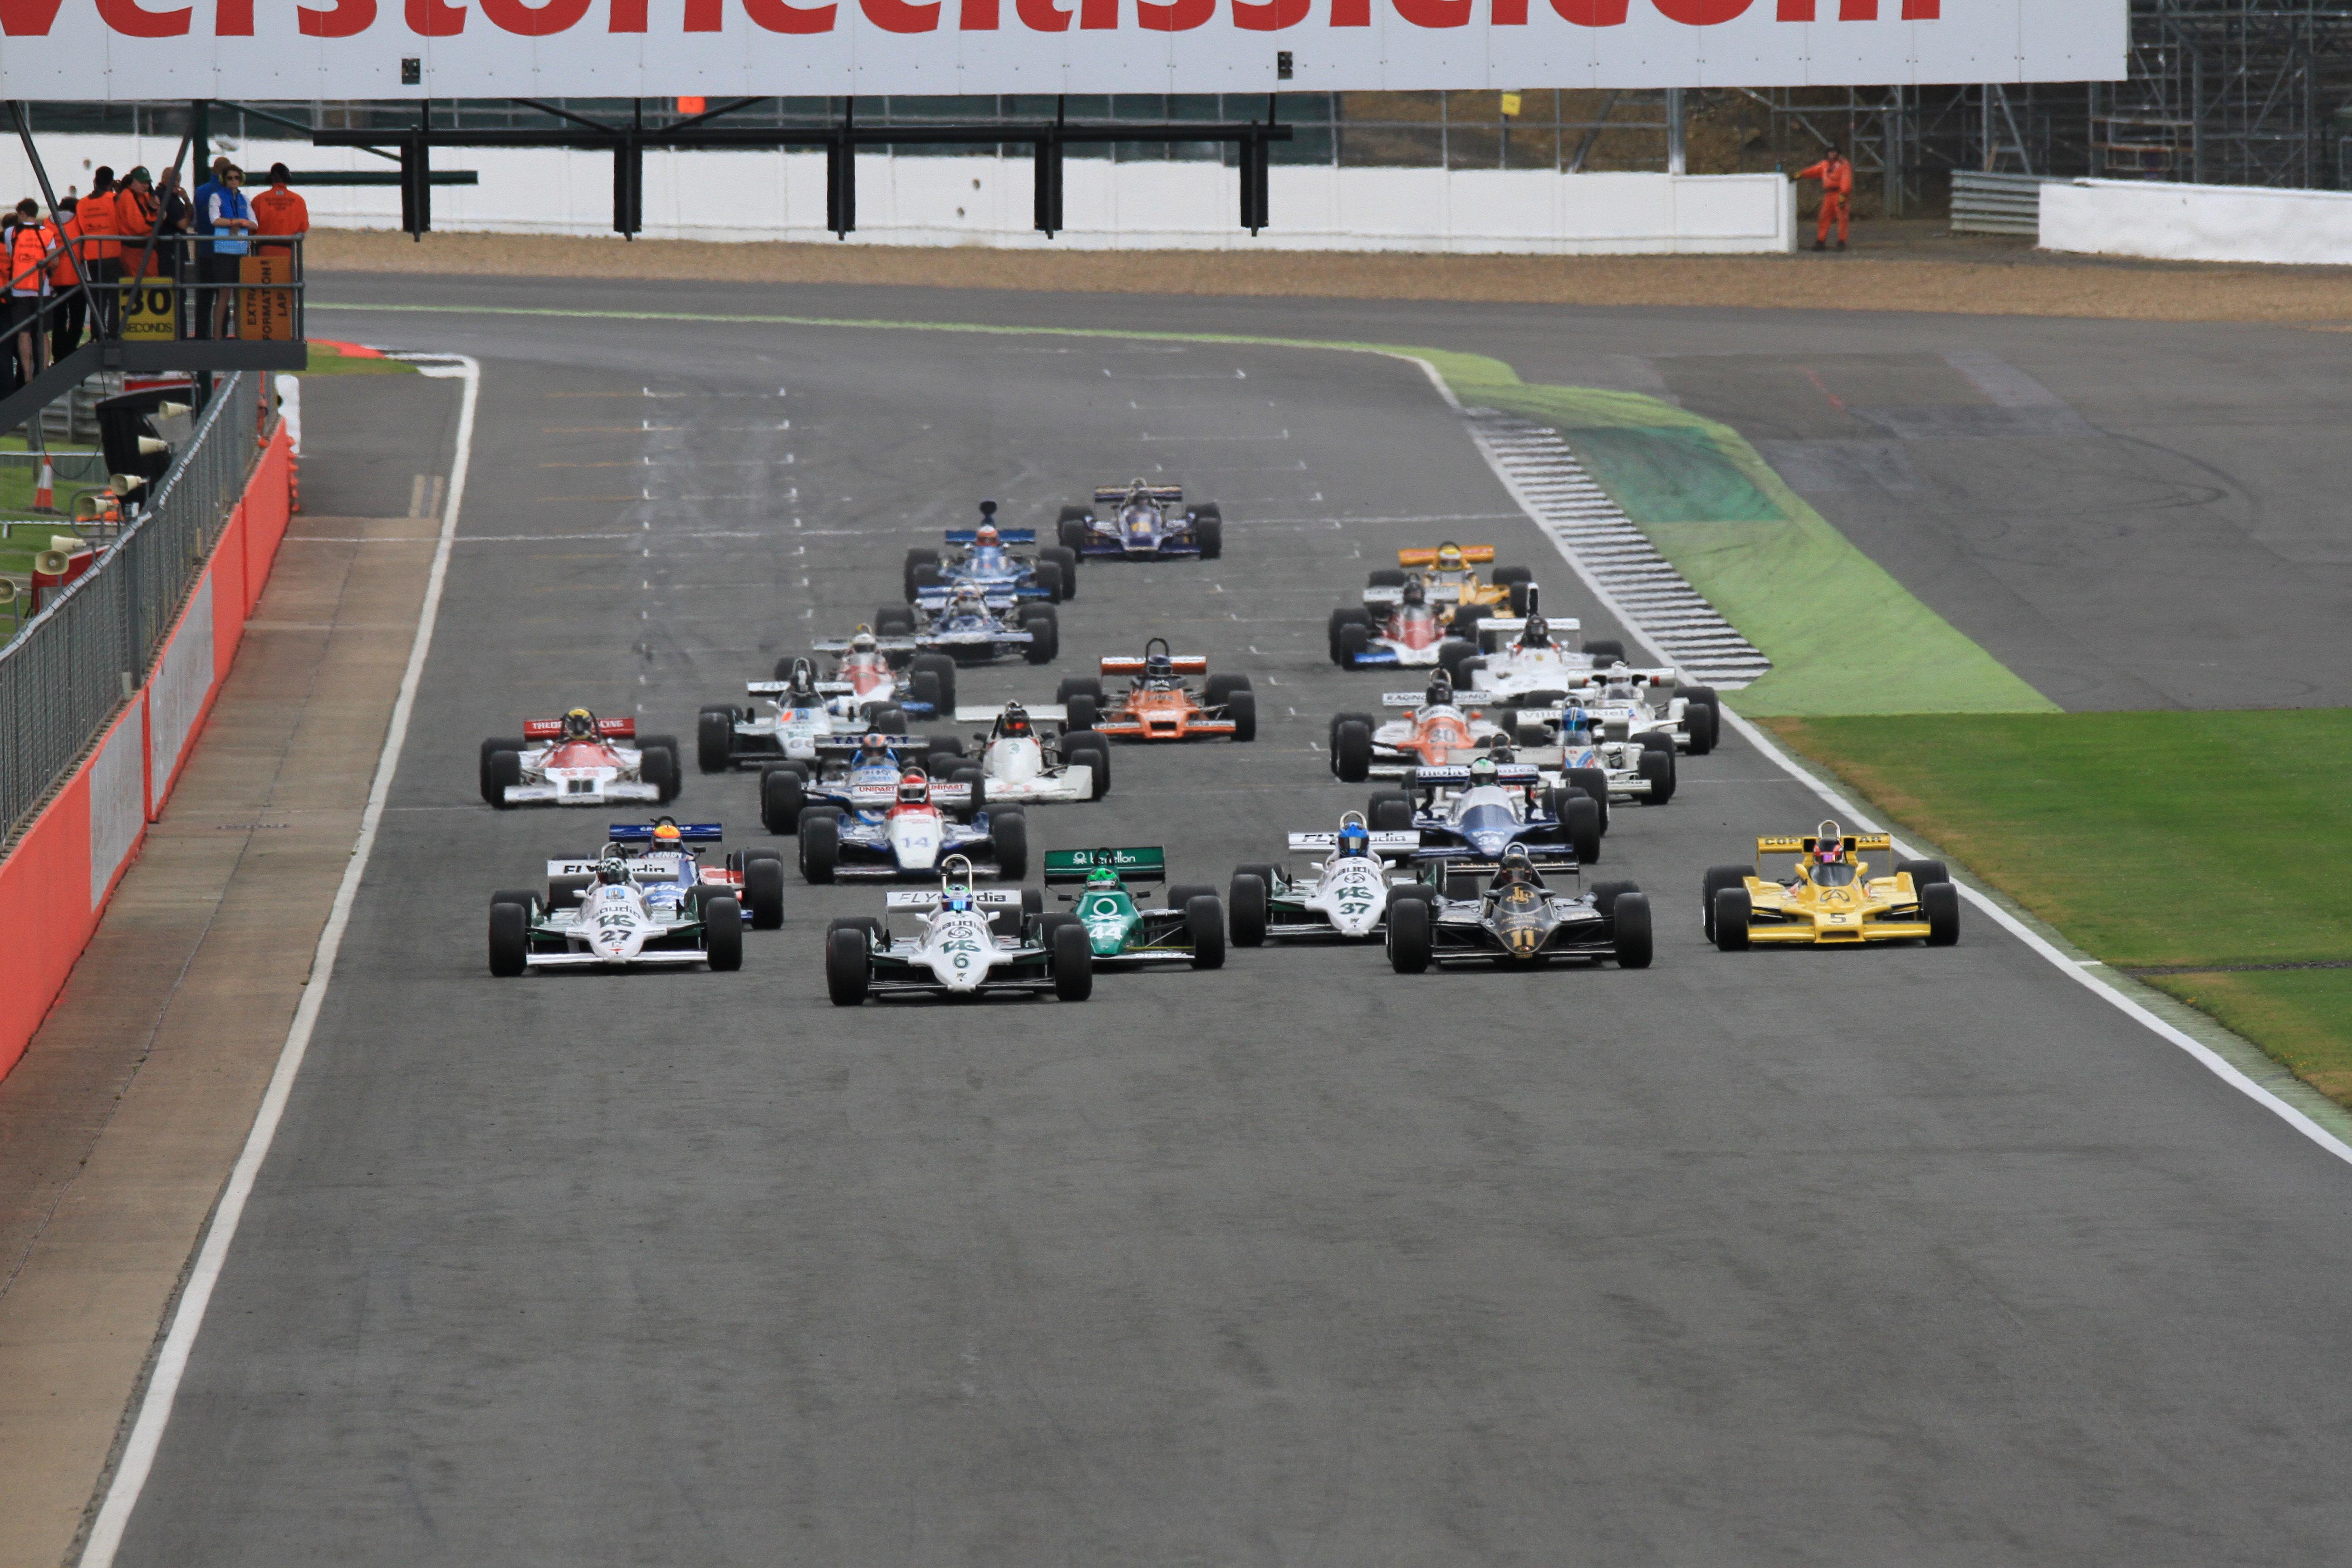 European Festivals Highlight 2017 Masters Historic Racing Calendar ...